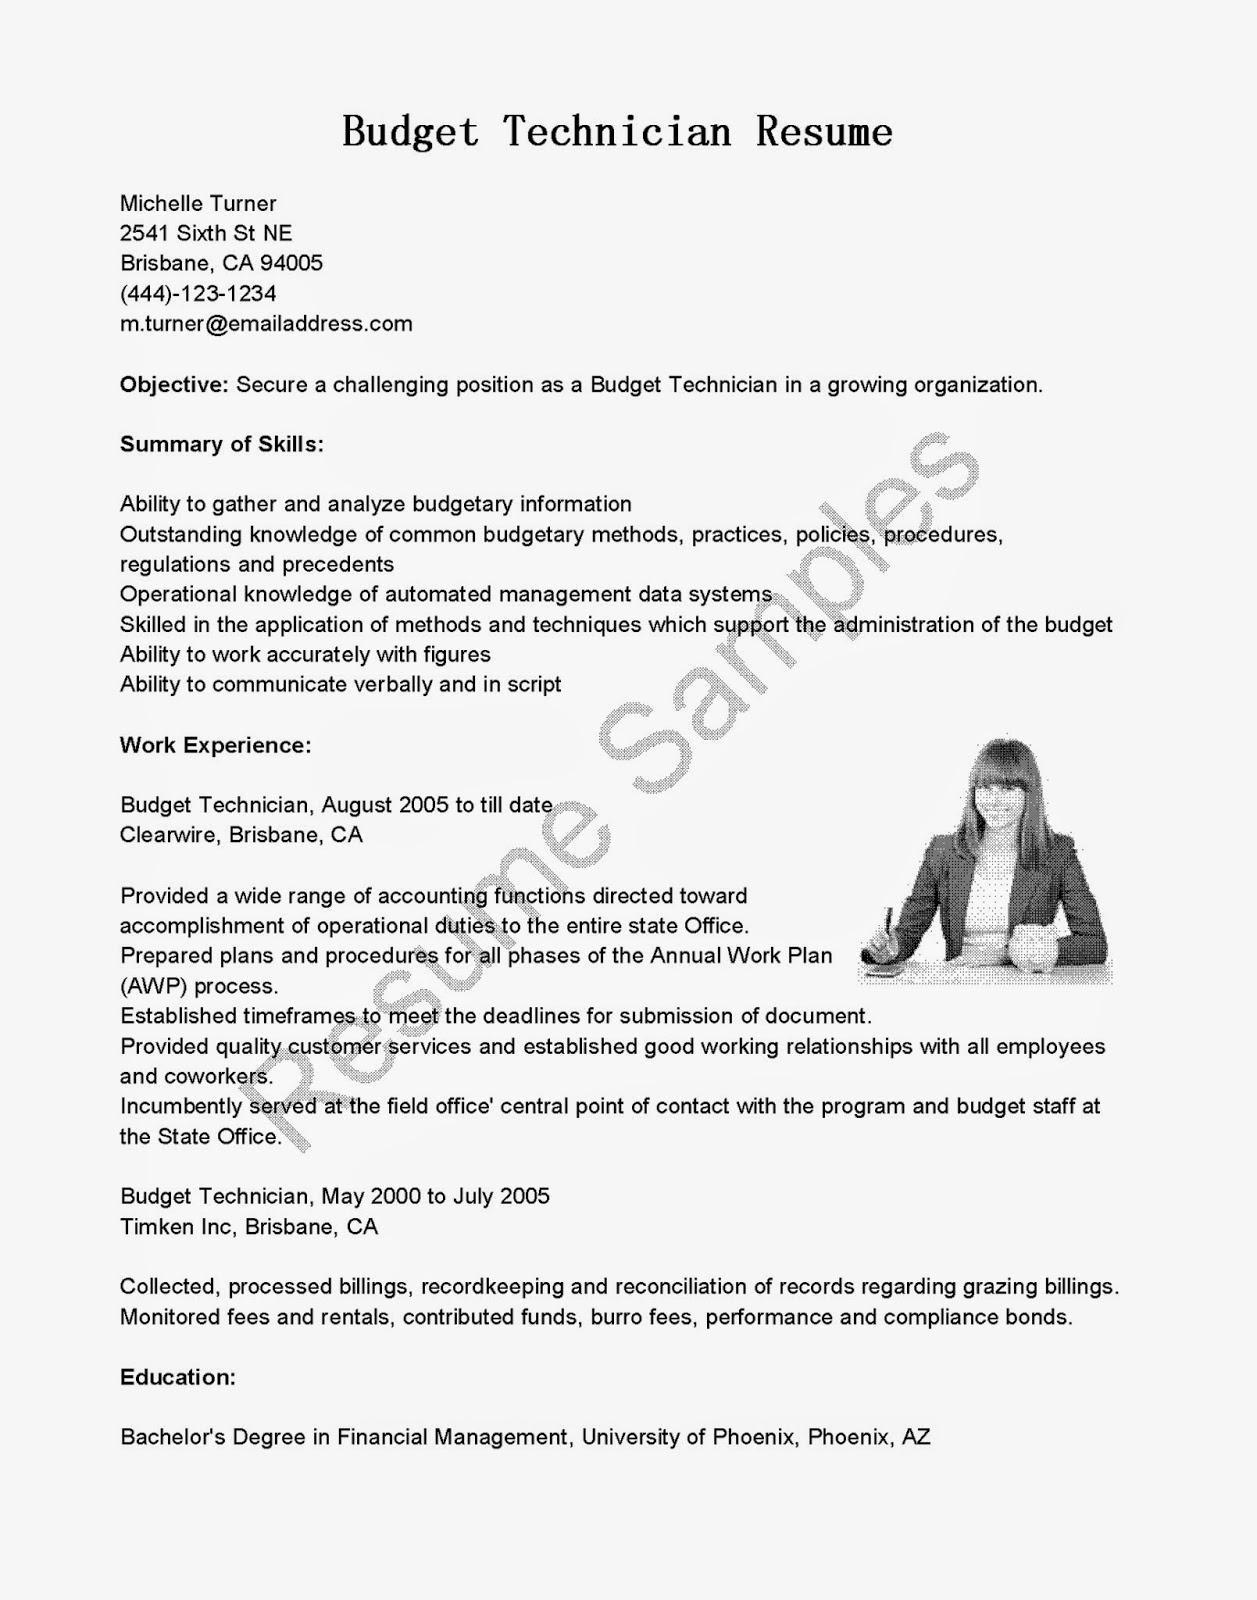 resume samples  budget technician resume sample